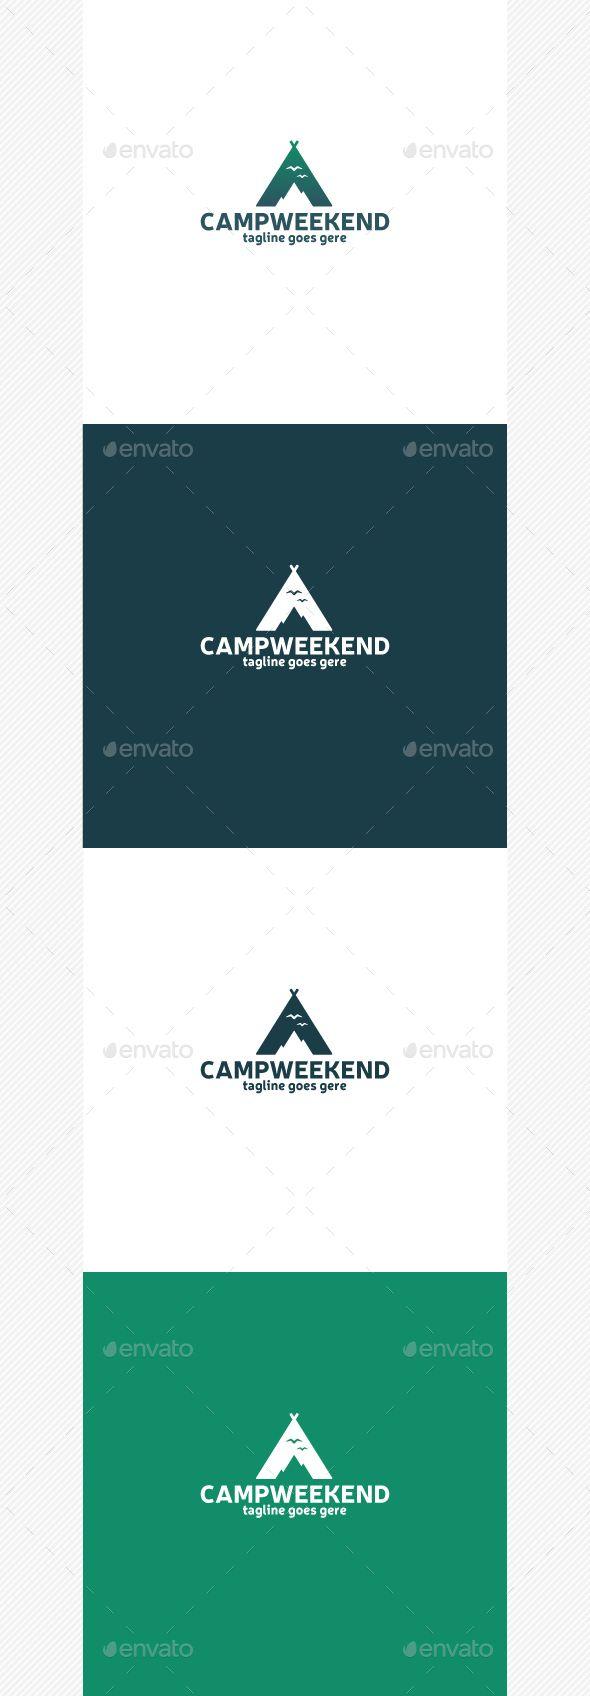 pin by bashooka web  u0026 graphic design on logo template 2017